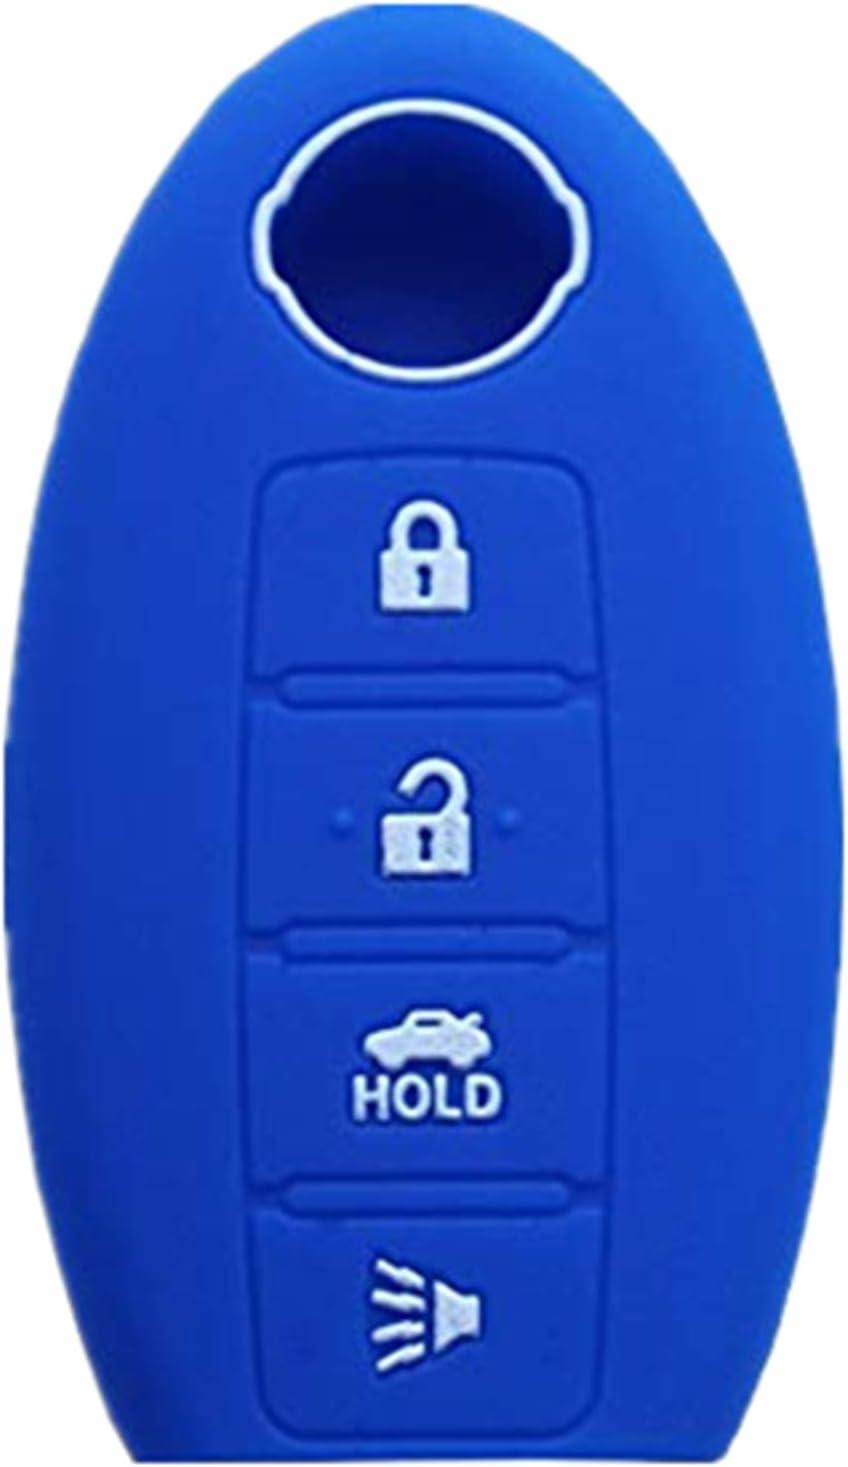 Rpkey Silicone Keyless Entry Remote Control Key Fob Cover Case protector For Nissan Altima Maxima Murano Versa 285E3-JA05A KR55WK48903 Blue